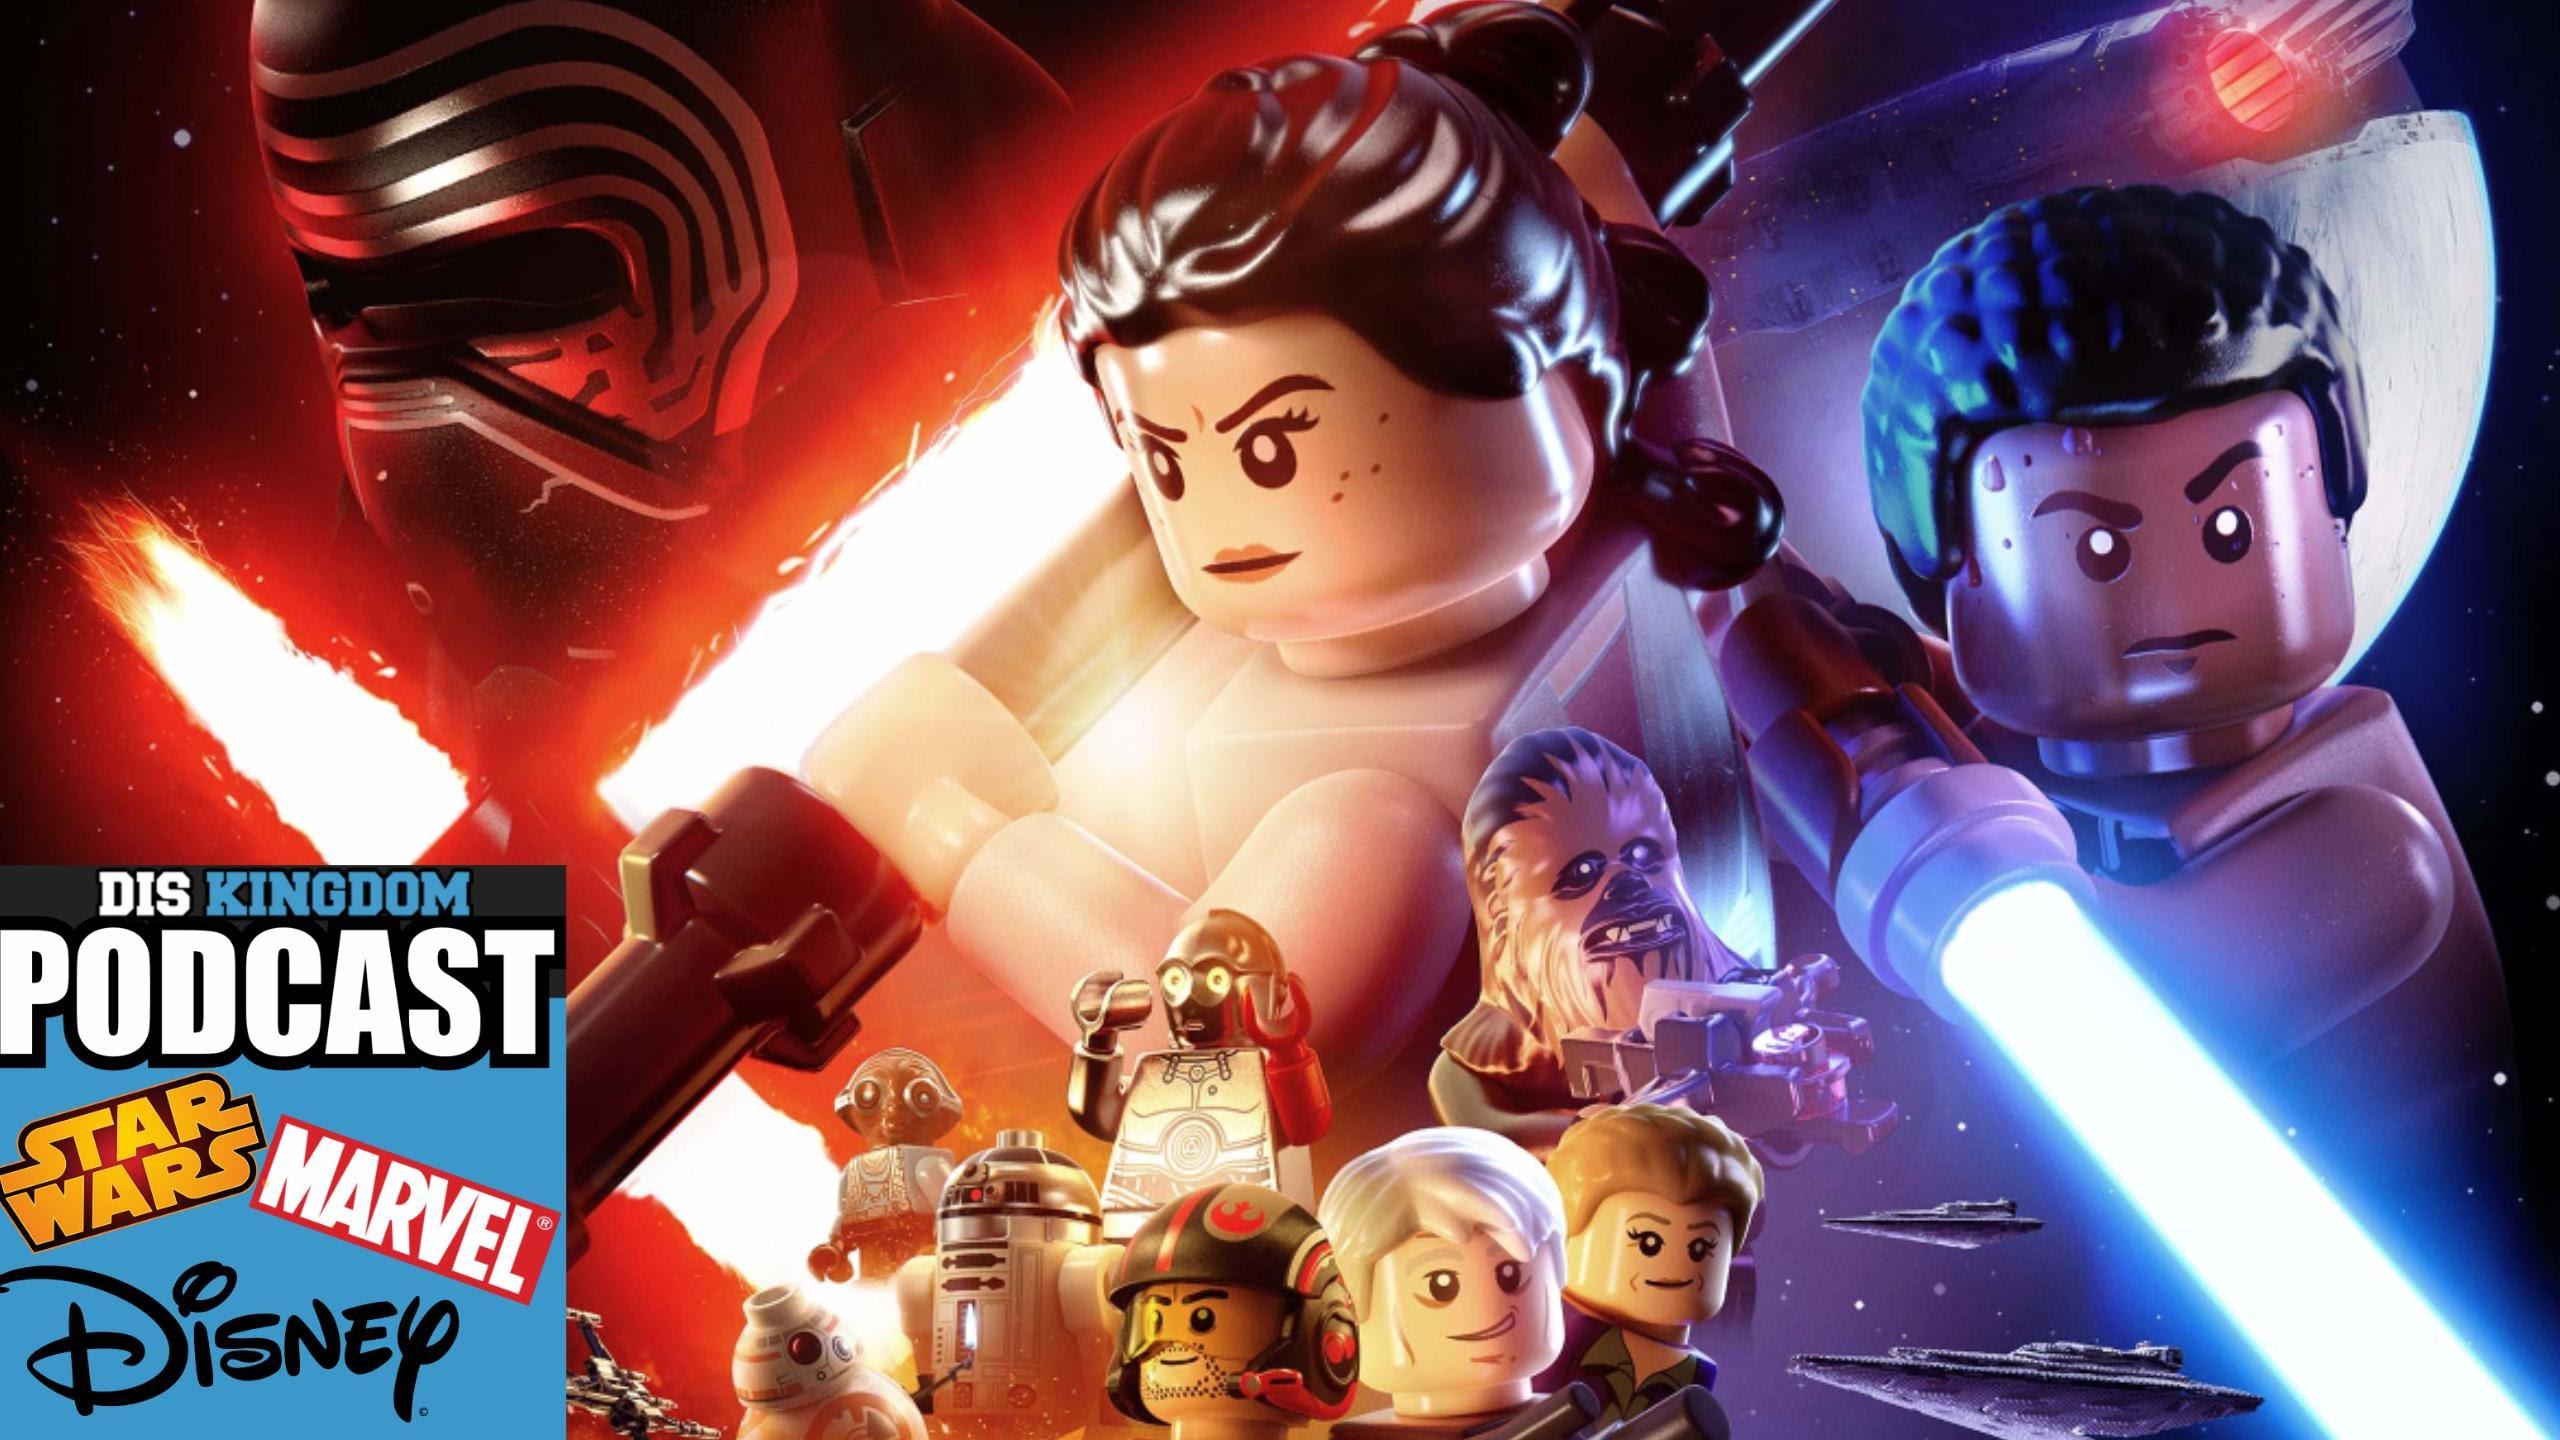 Let's Talk LEGO Star Wars The Force Awakens – DisKingdom Podcast